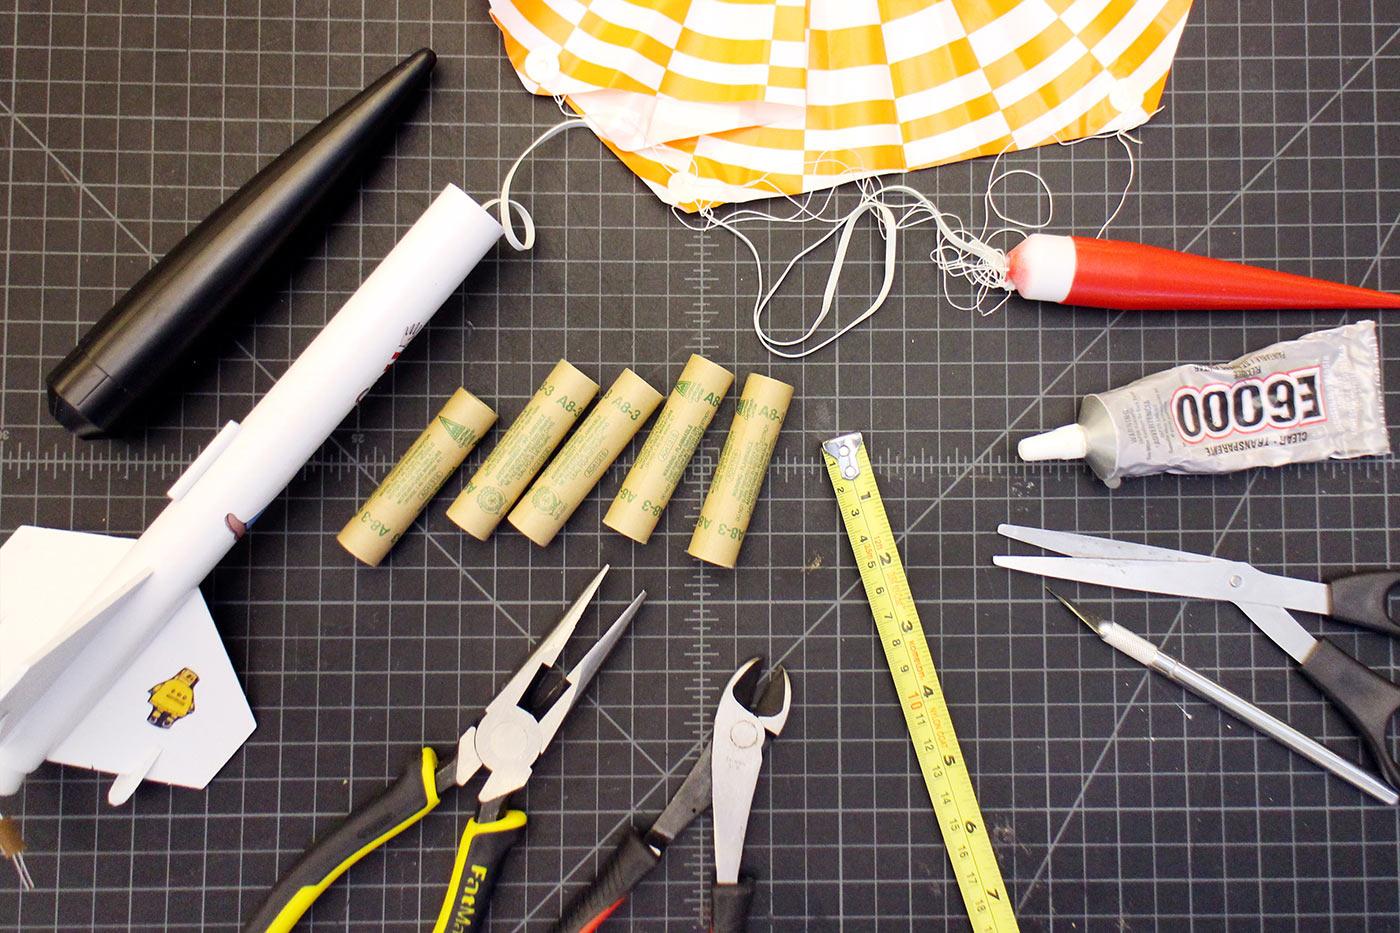 Tools + Supplies